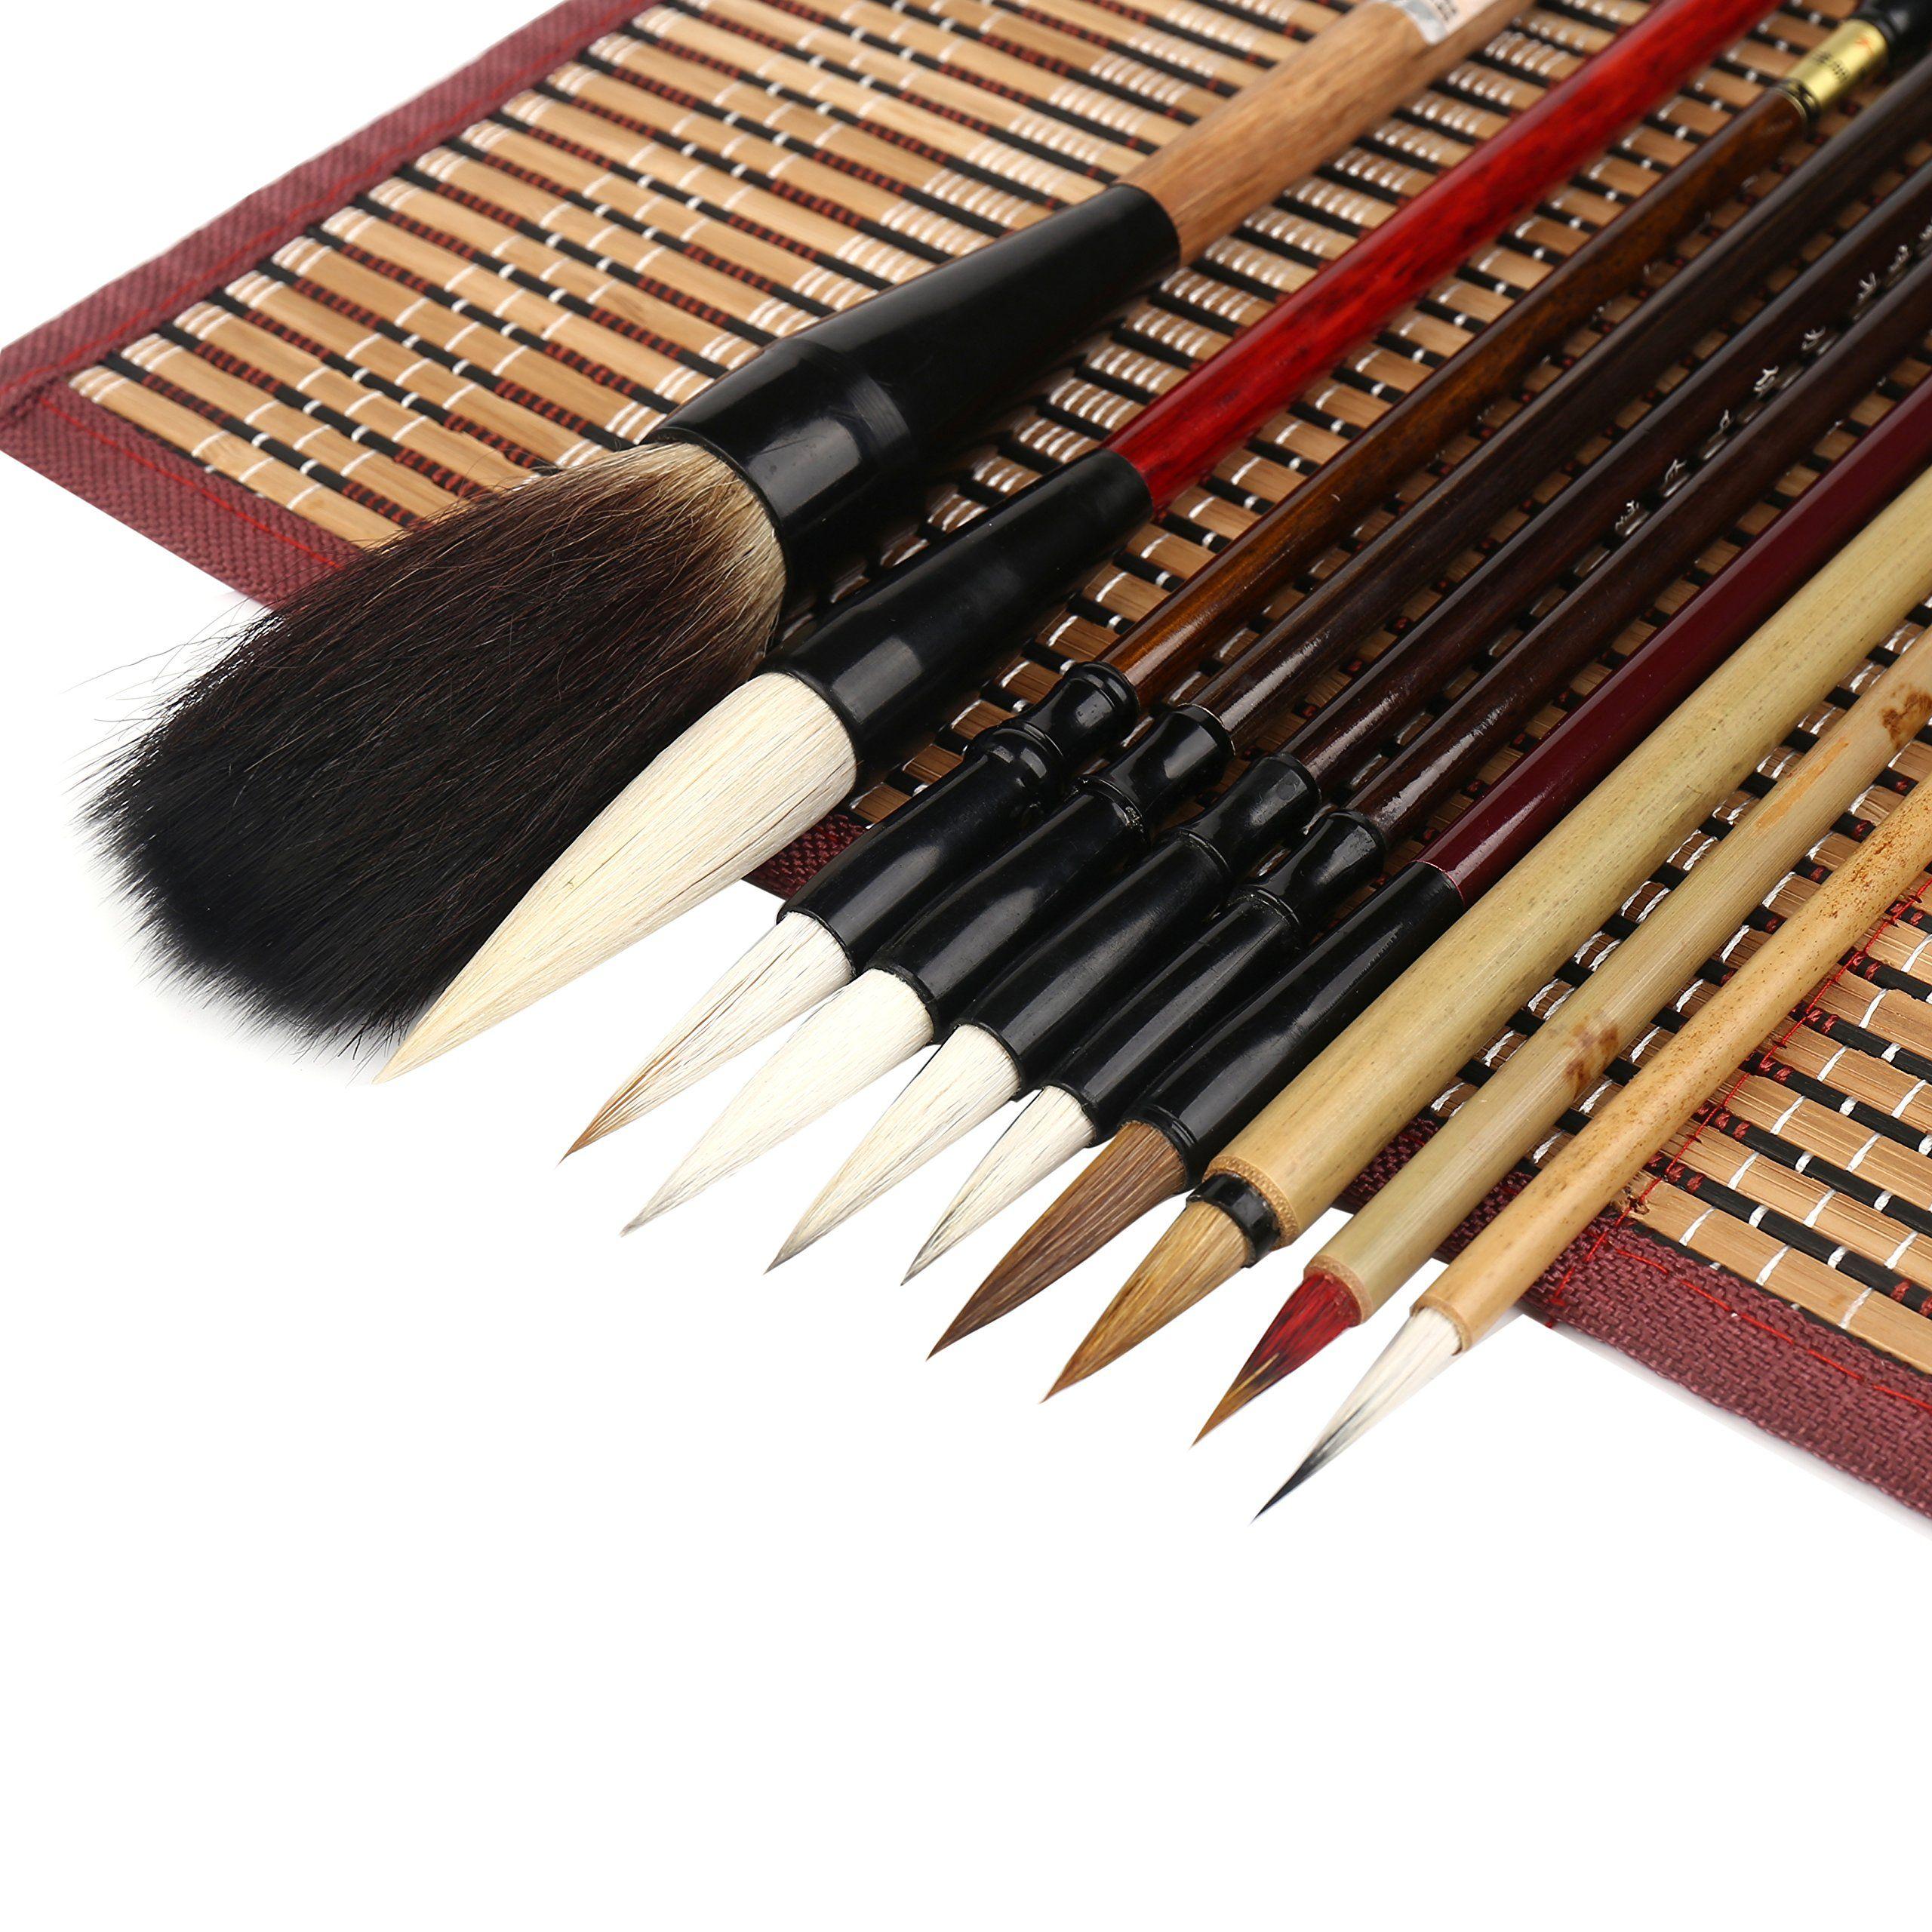 Corcio Shanlian Hubi Writing Brush Watercolor Chinese Calligraphy